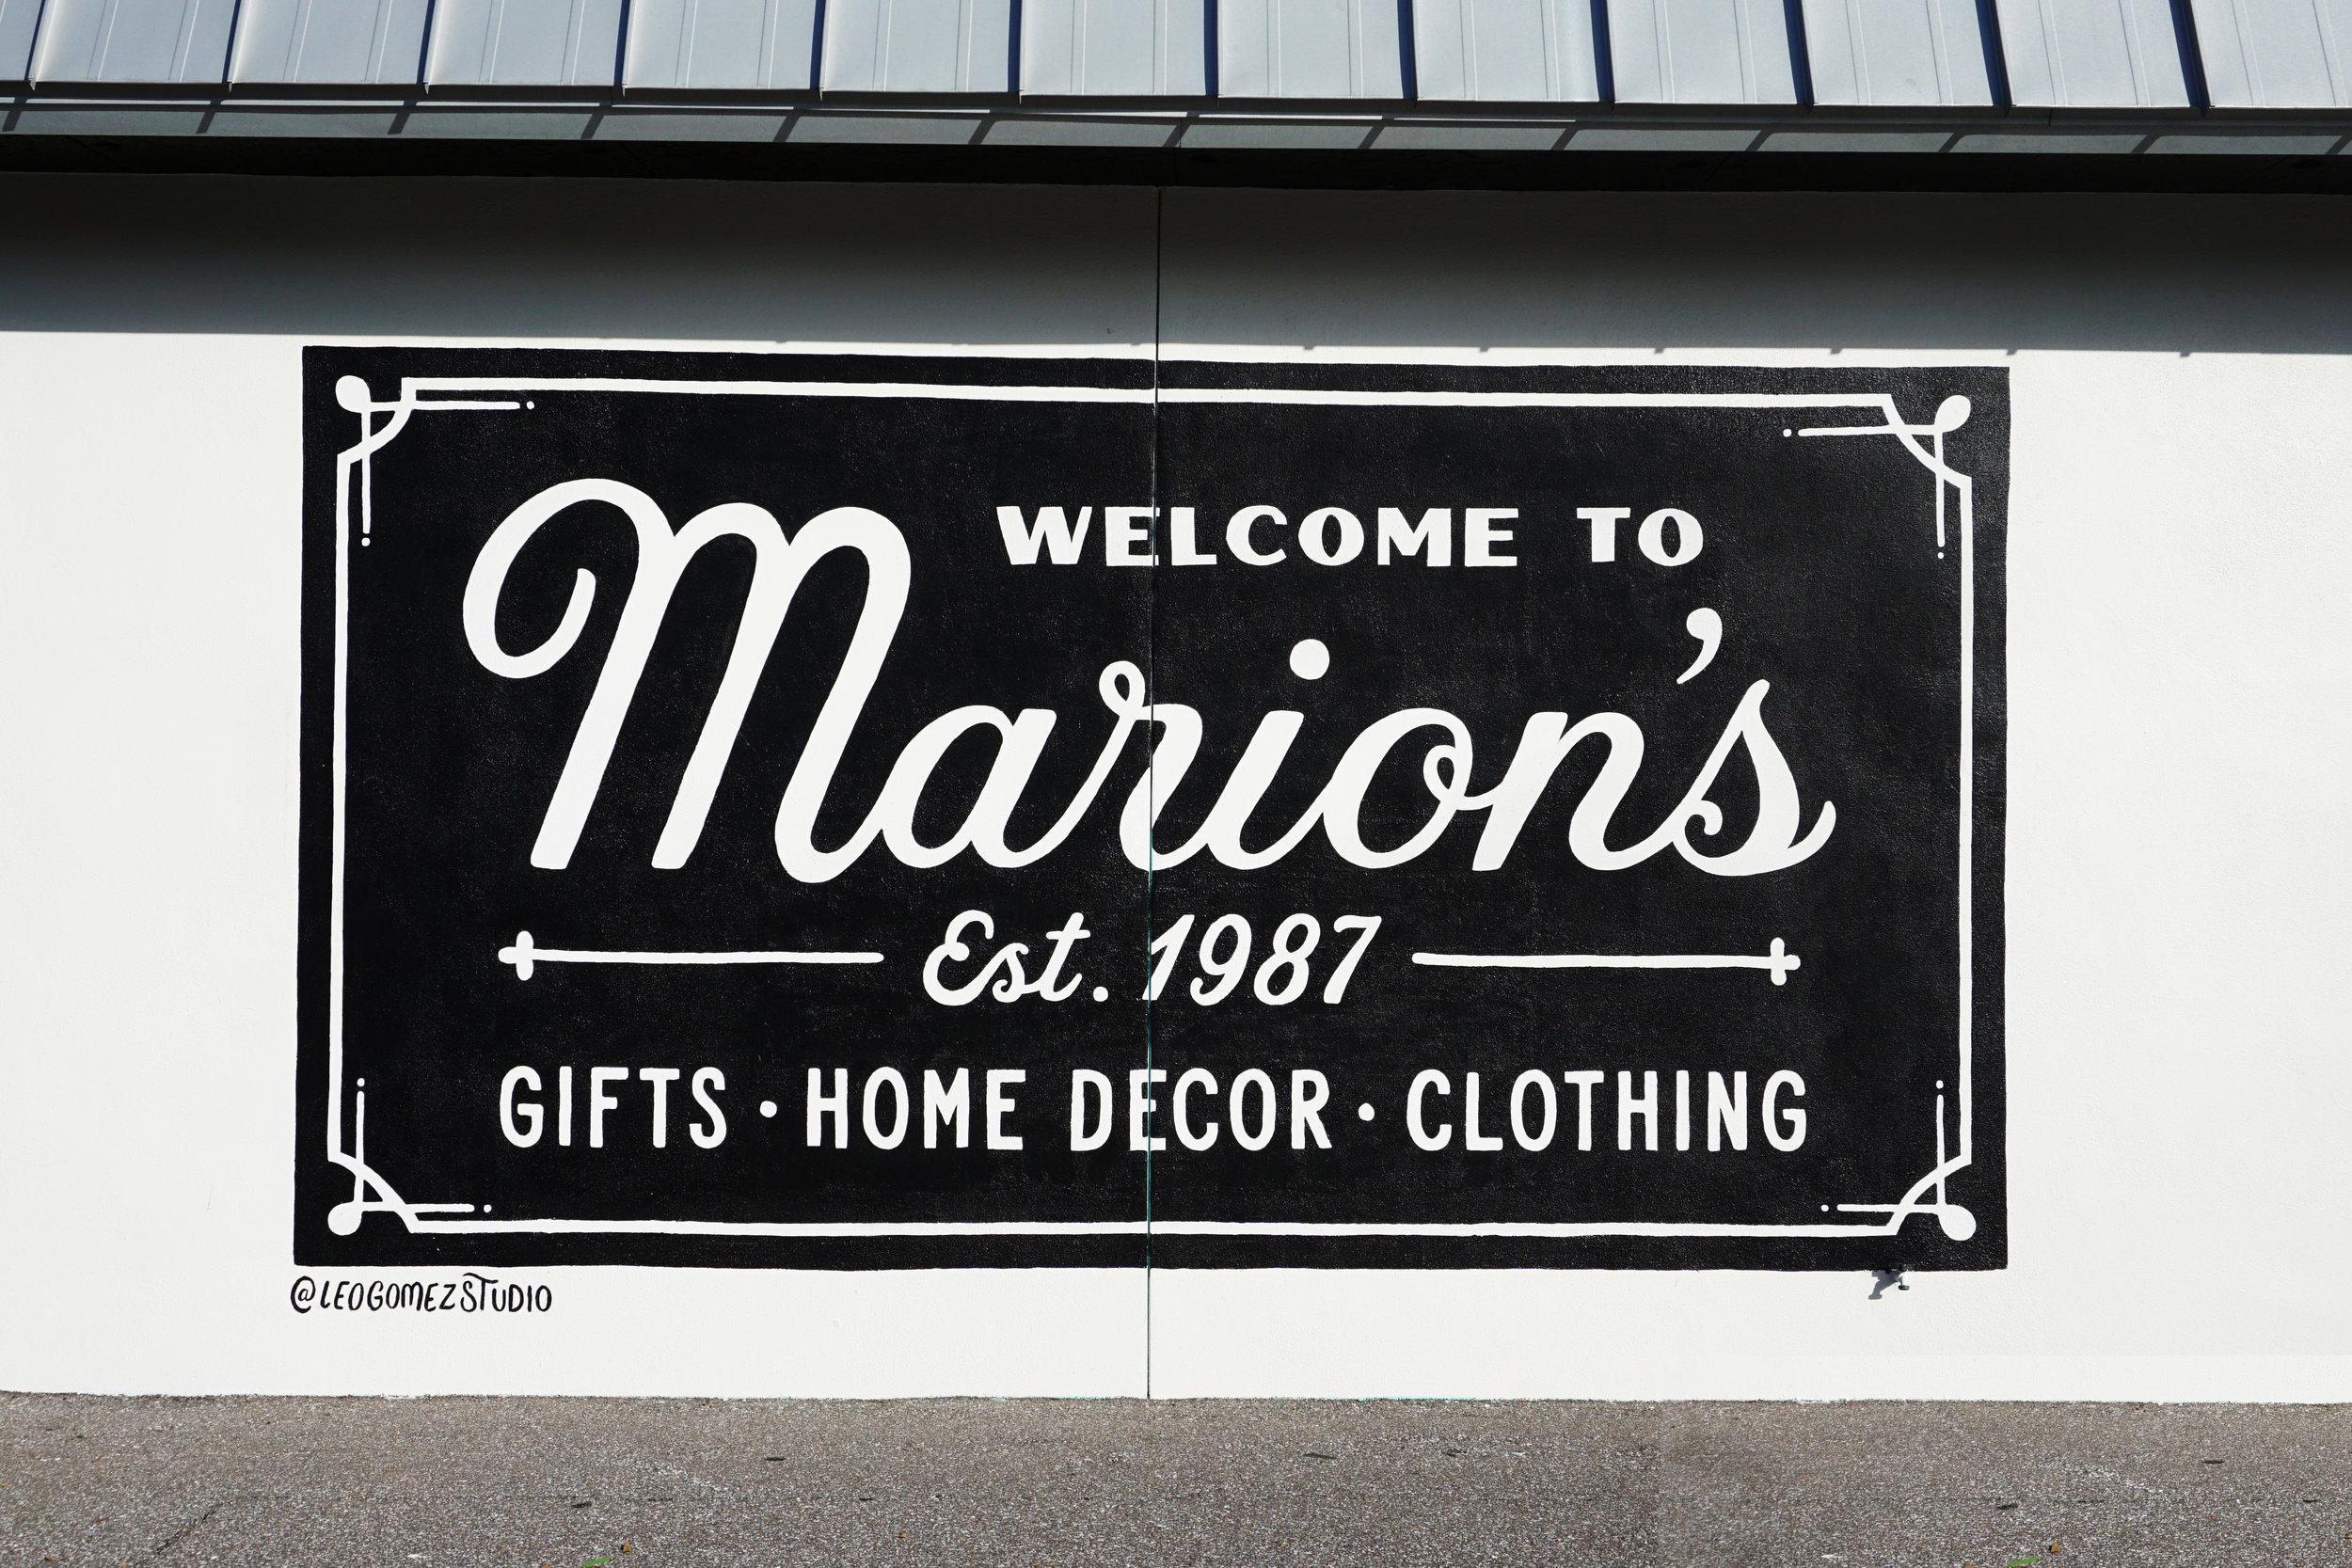 Leo-Gomez-Studio-Marions-Hand-Painted-Sign-01.JPG